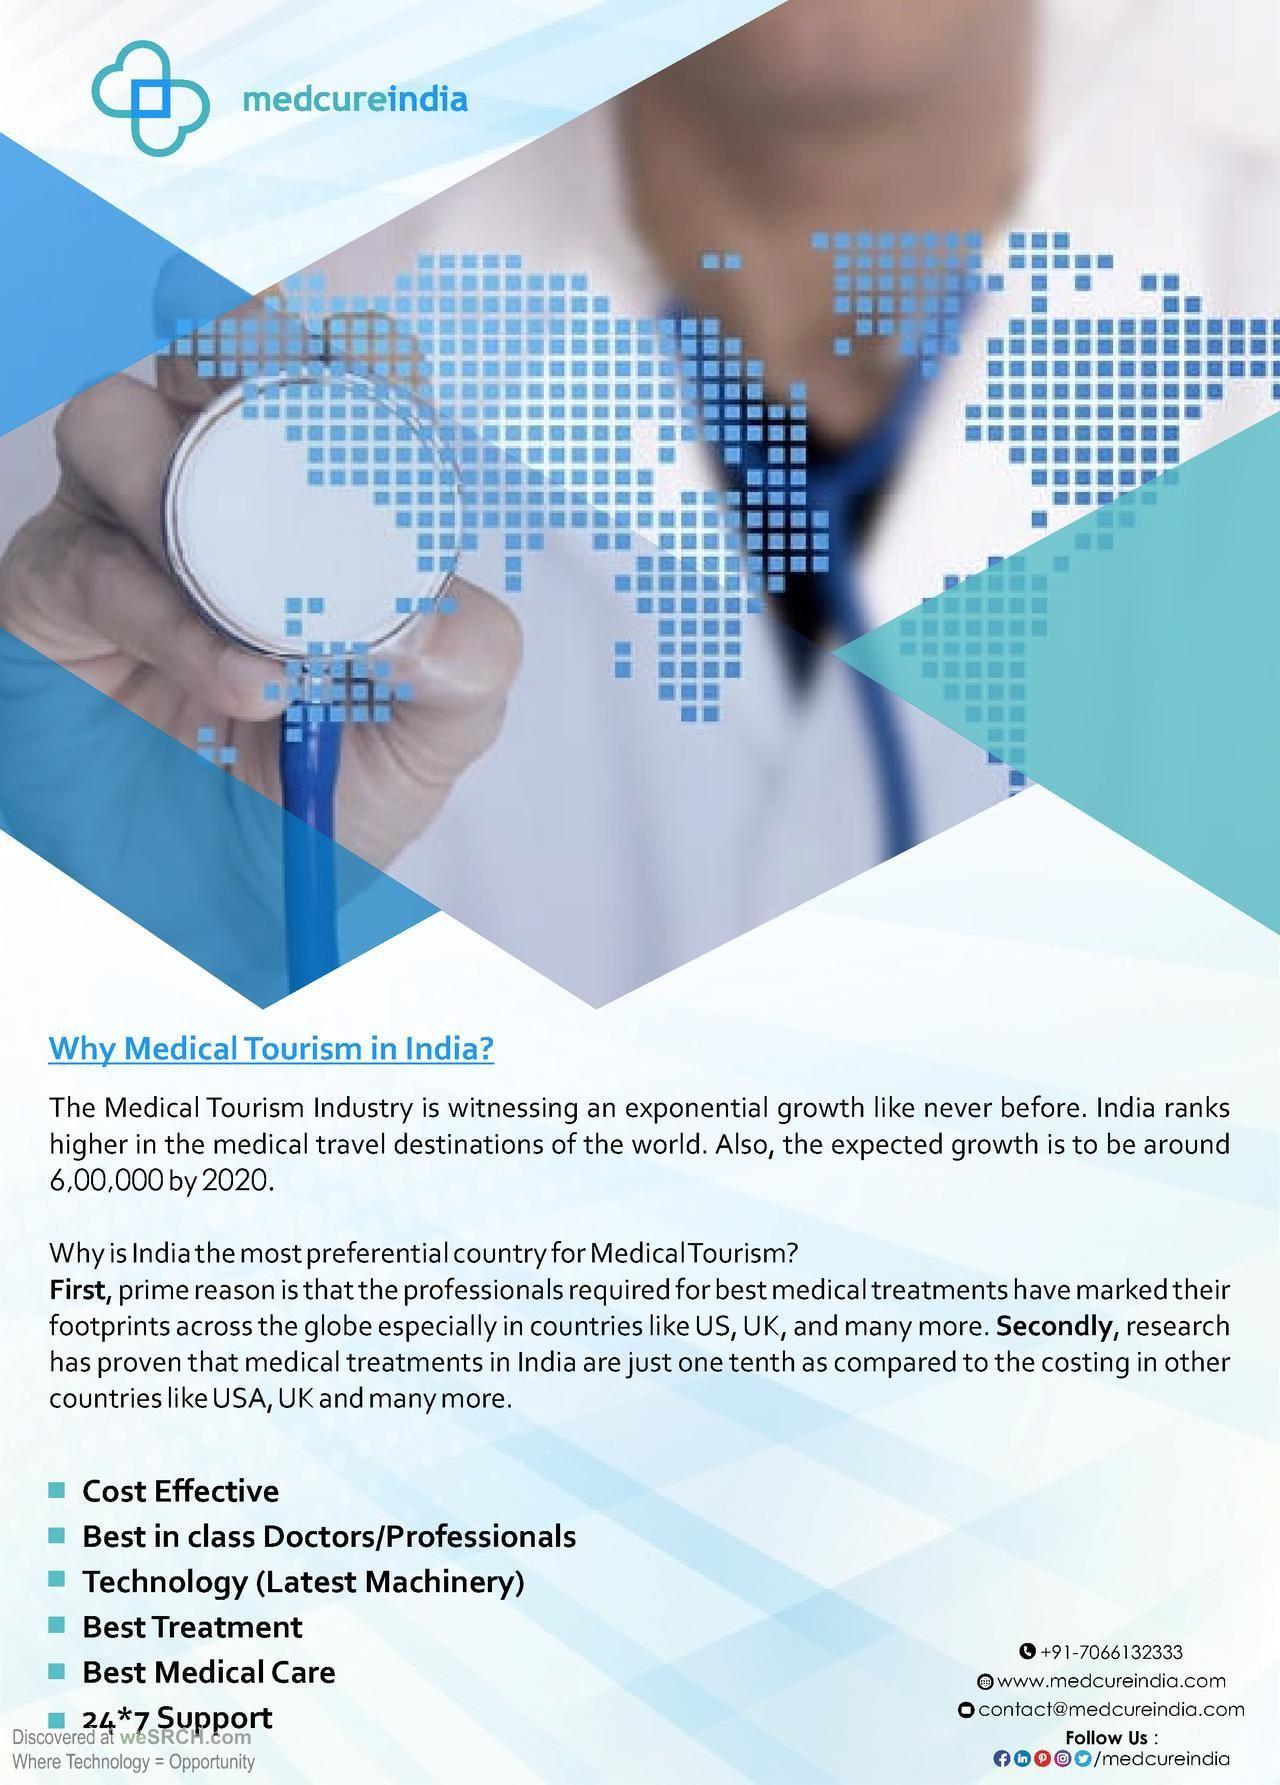 Medical tourism services India | Medcureindia ...